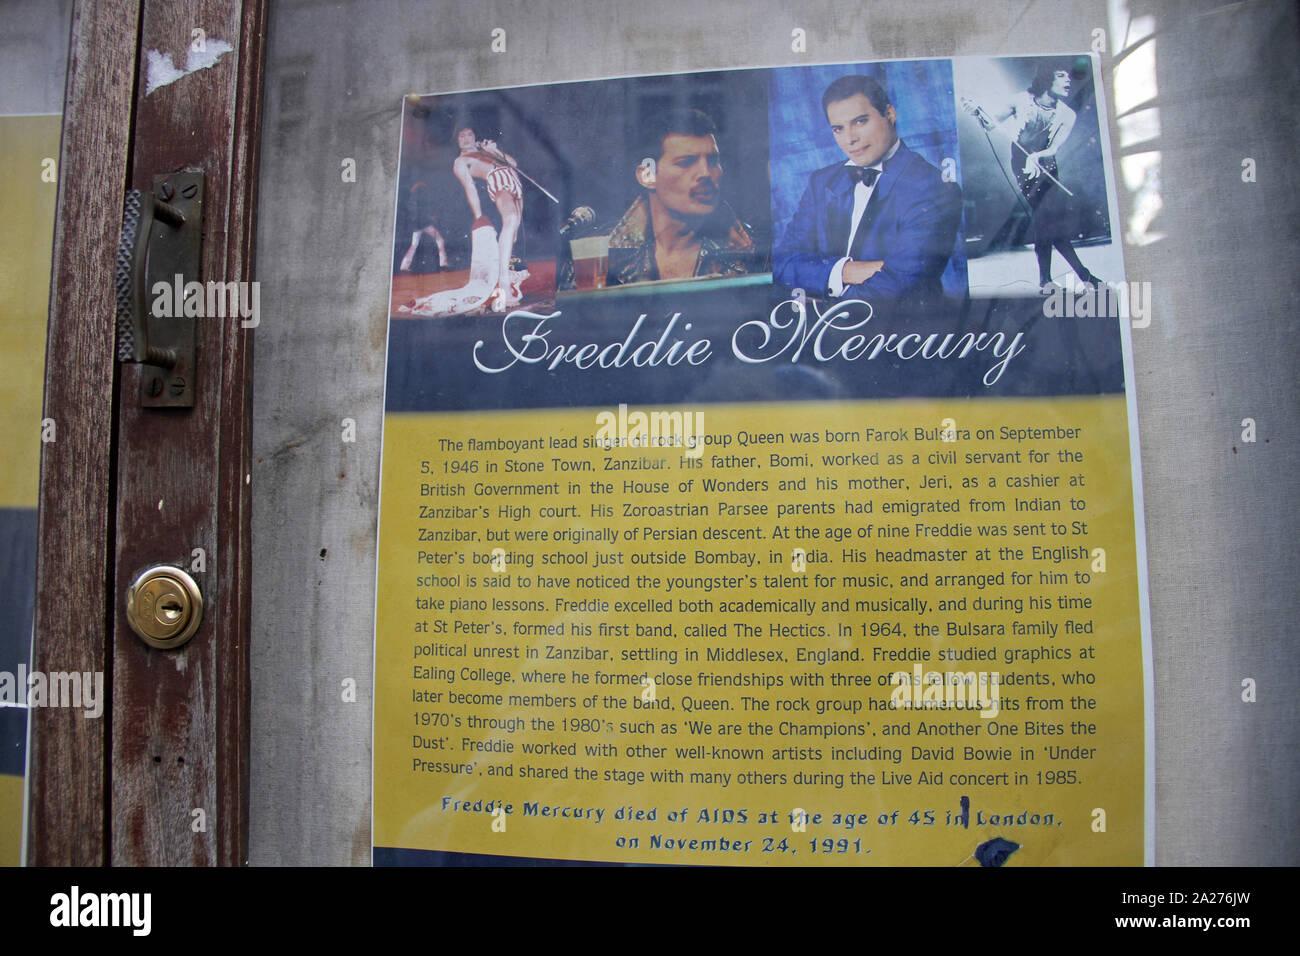 Historical and bibliographical poster of Freddie Mercury encased in glass inside the Mercury House Museum, Stone Town, Zanzibar, Unguja Island, Tanzania. Stock Photo